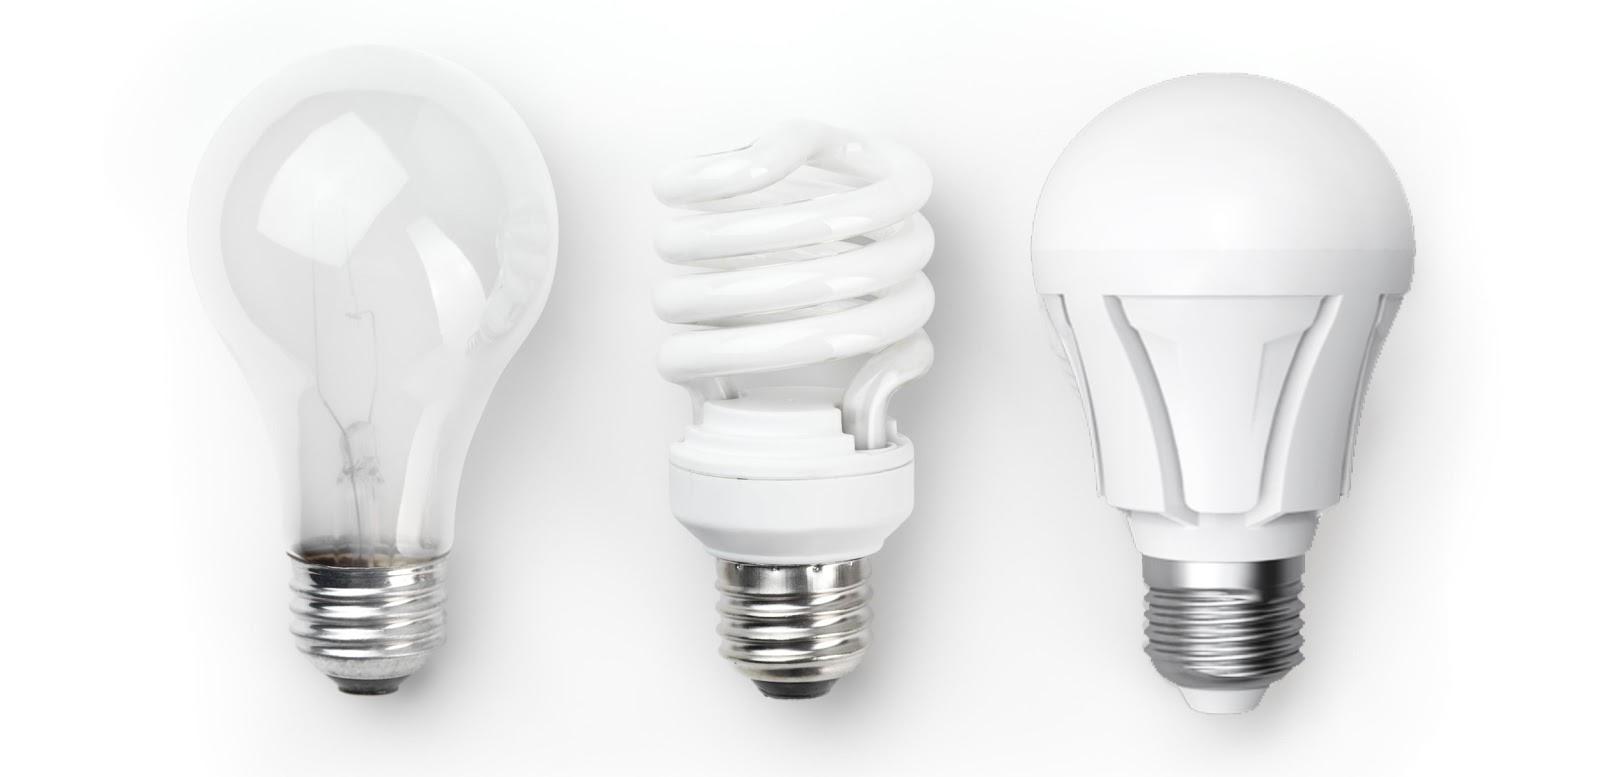 Illuminazione led casa confrontare le lampadine led e for Illuminazione led